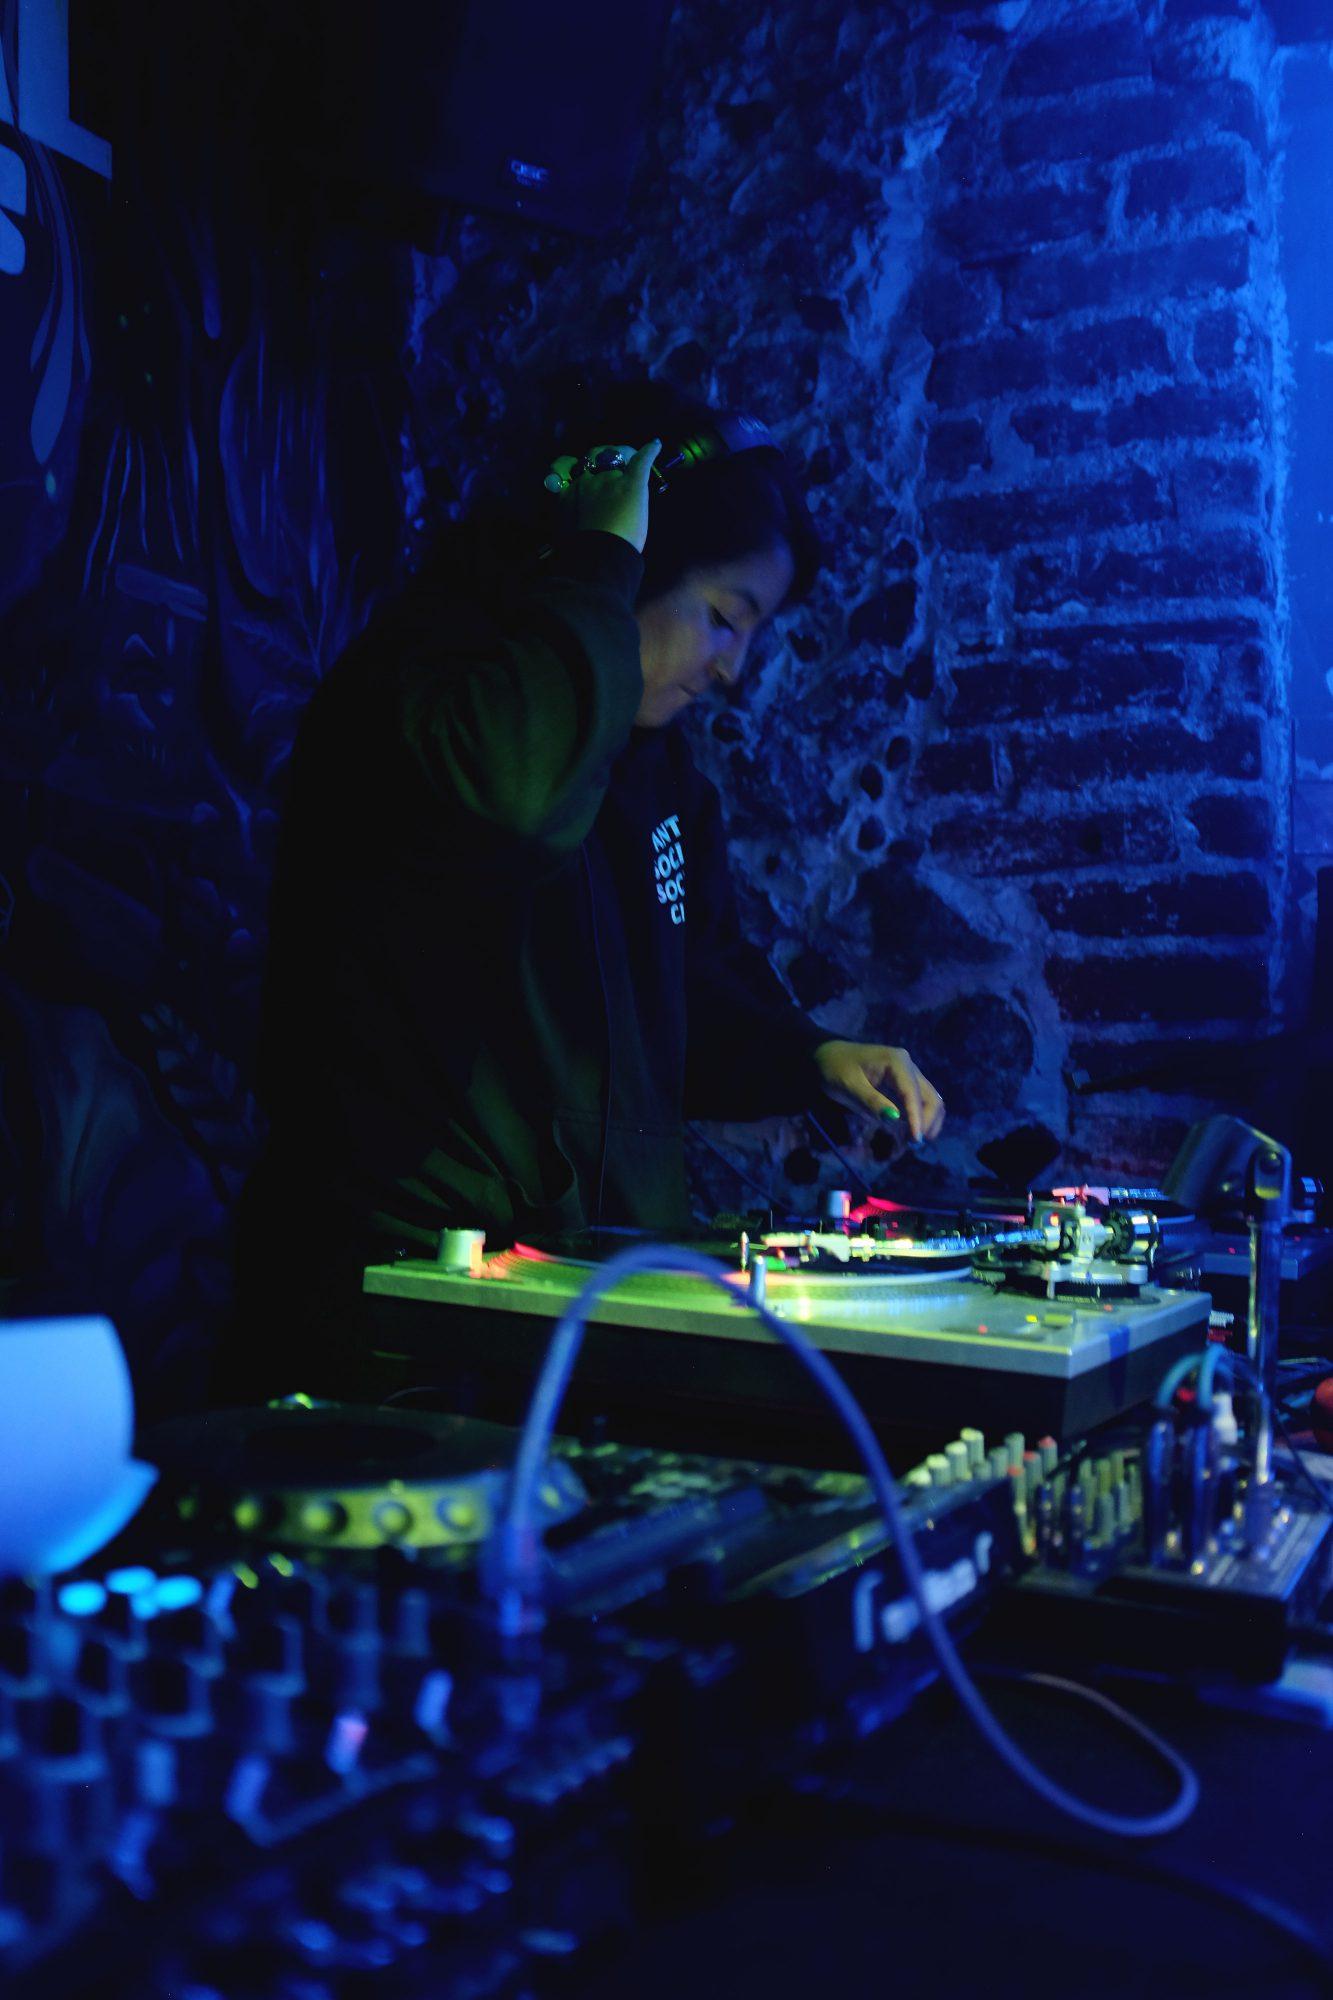 DJ-Invitada-at-Central-Funk-02-MOVELIKE© gallery item